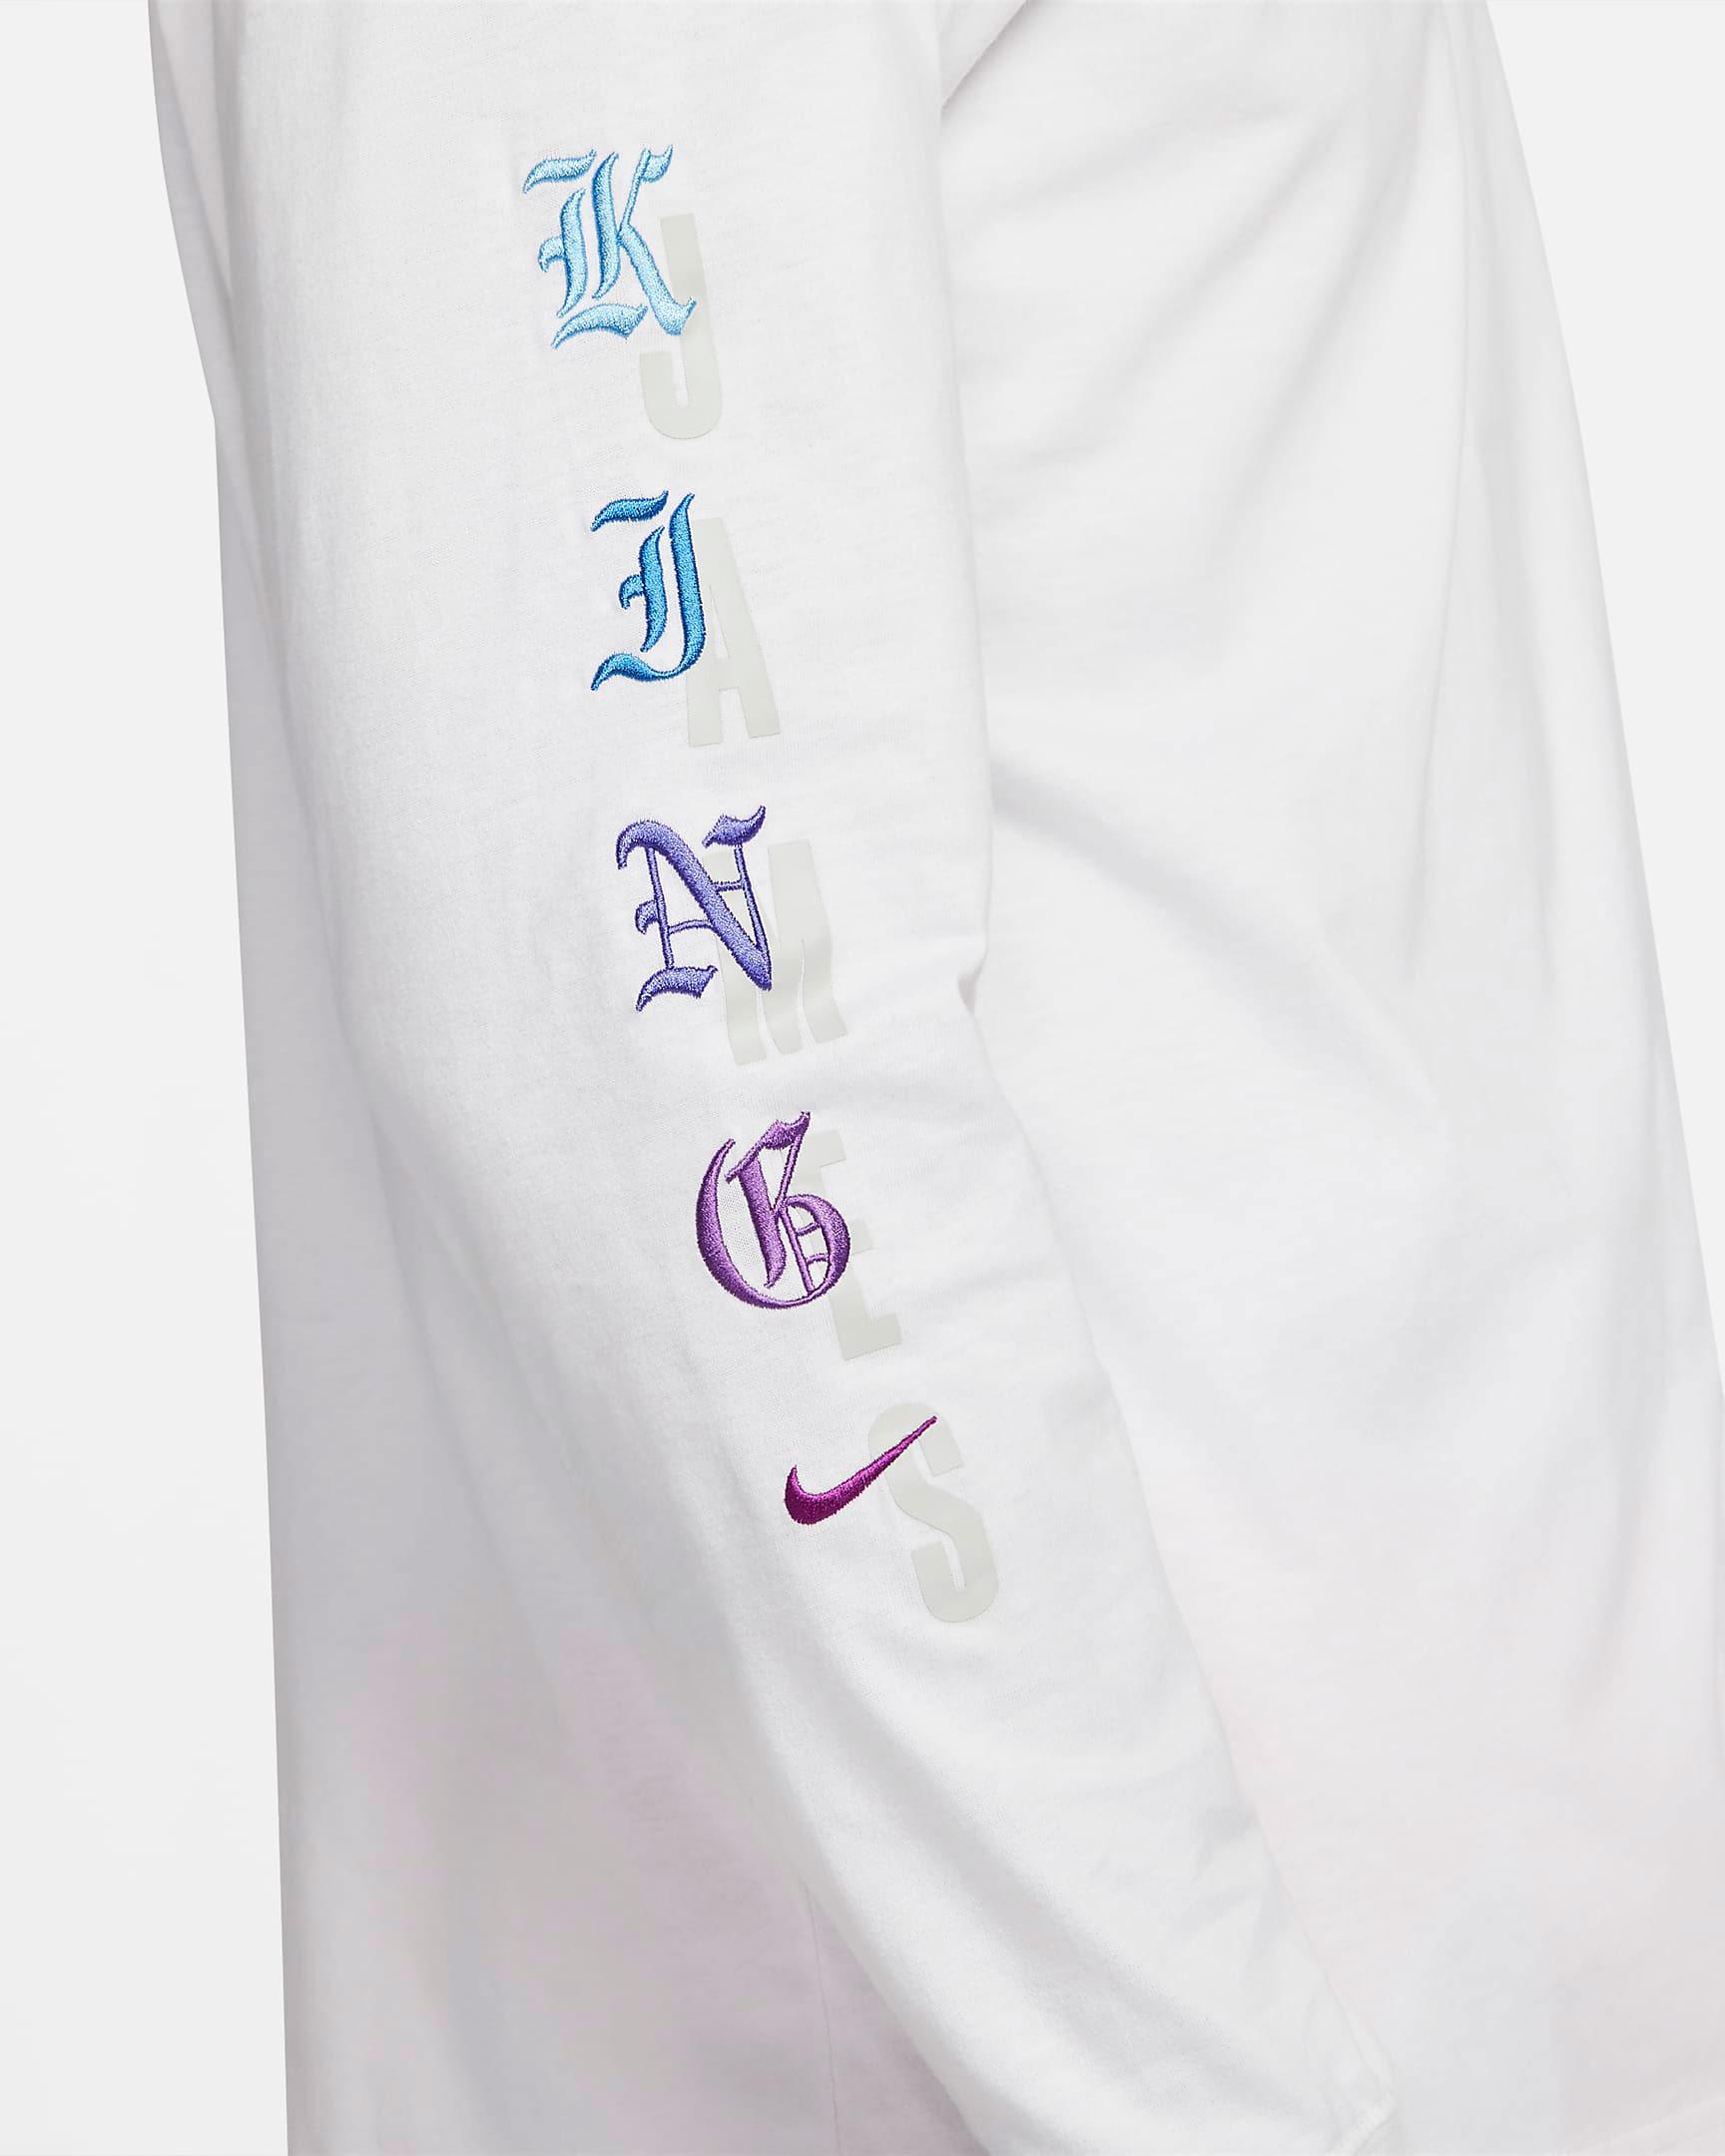 nike-lebron-18-multicolor-shirt-3